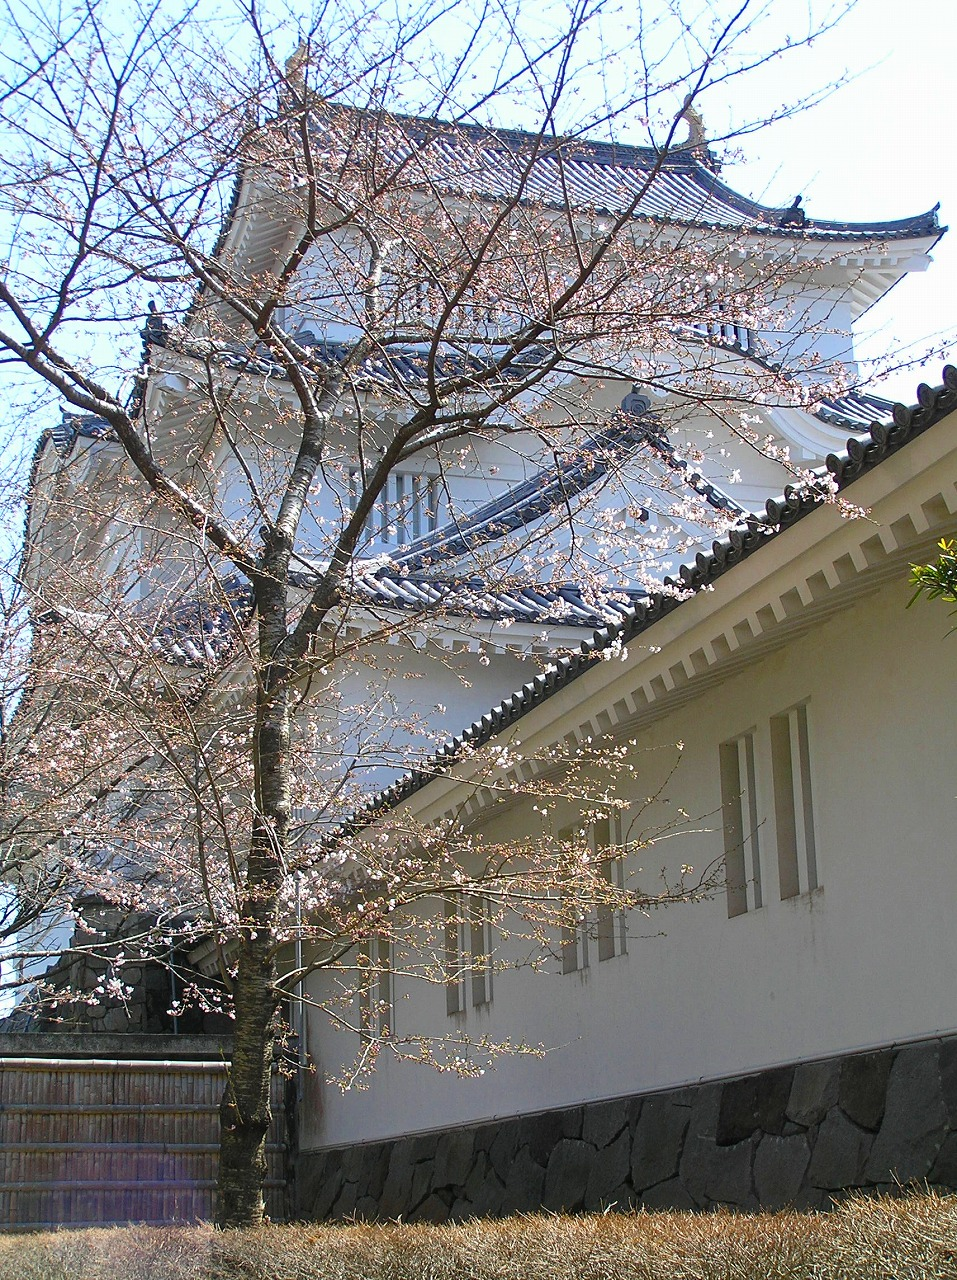 Town And Country Honda >> Ōtaki, Chiba - Wikipedia